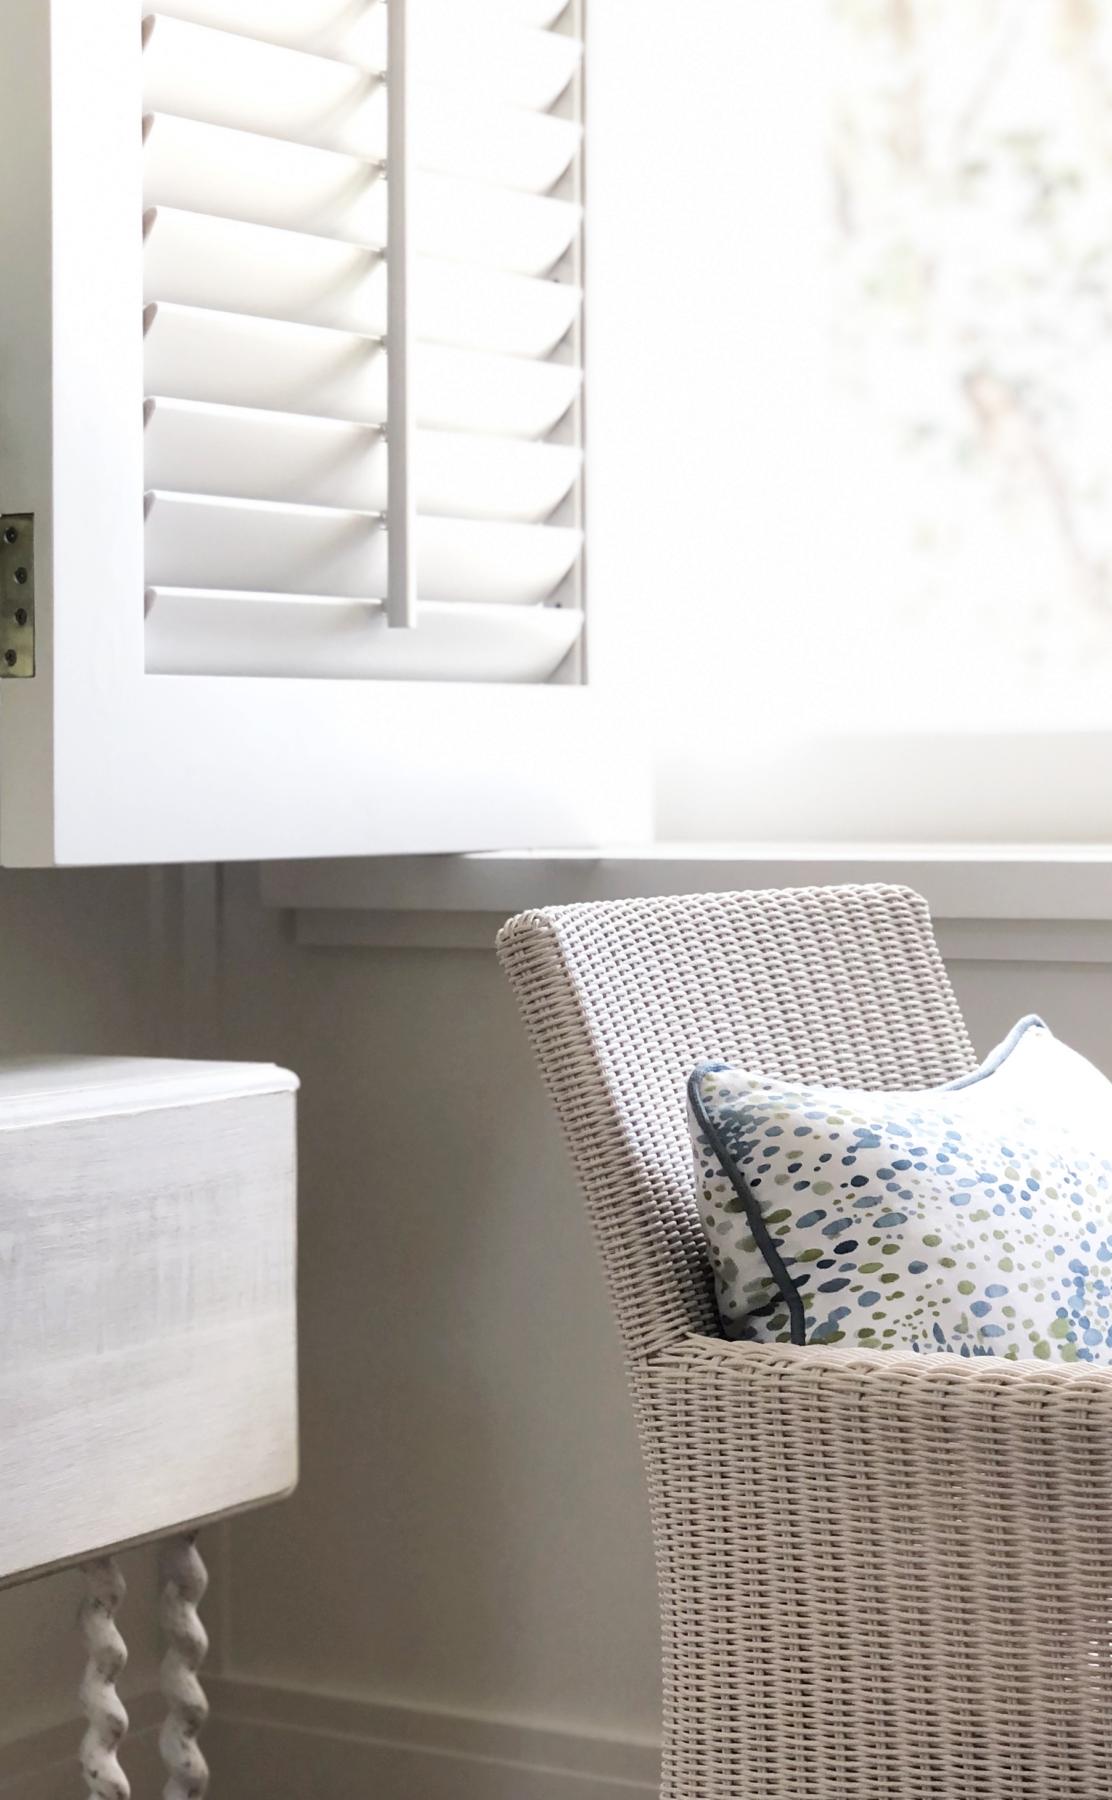 hamptons theme white rattan chair next to white window shutter